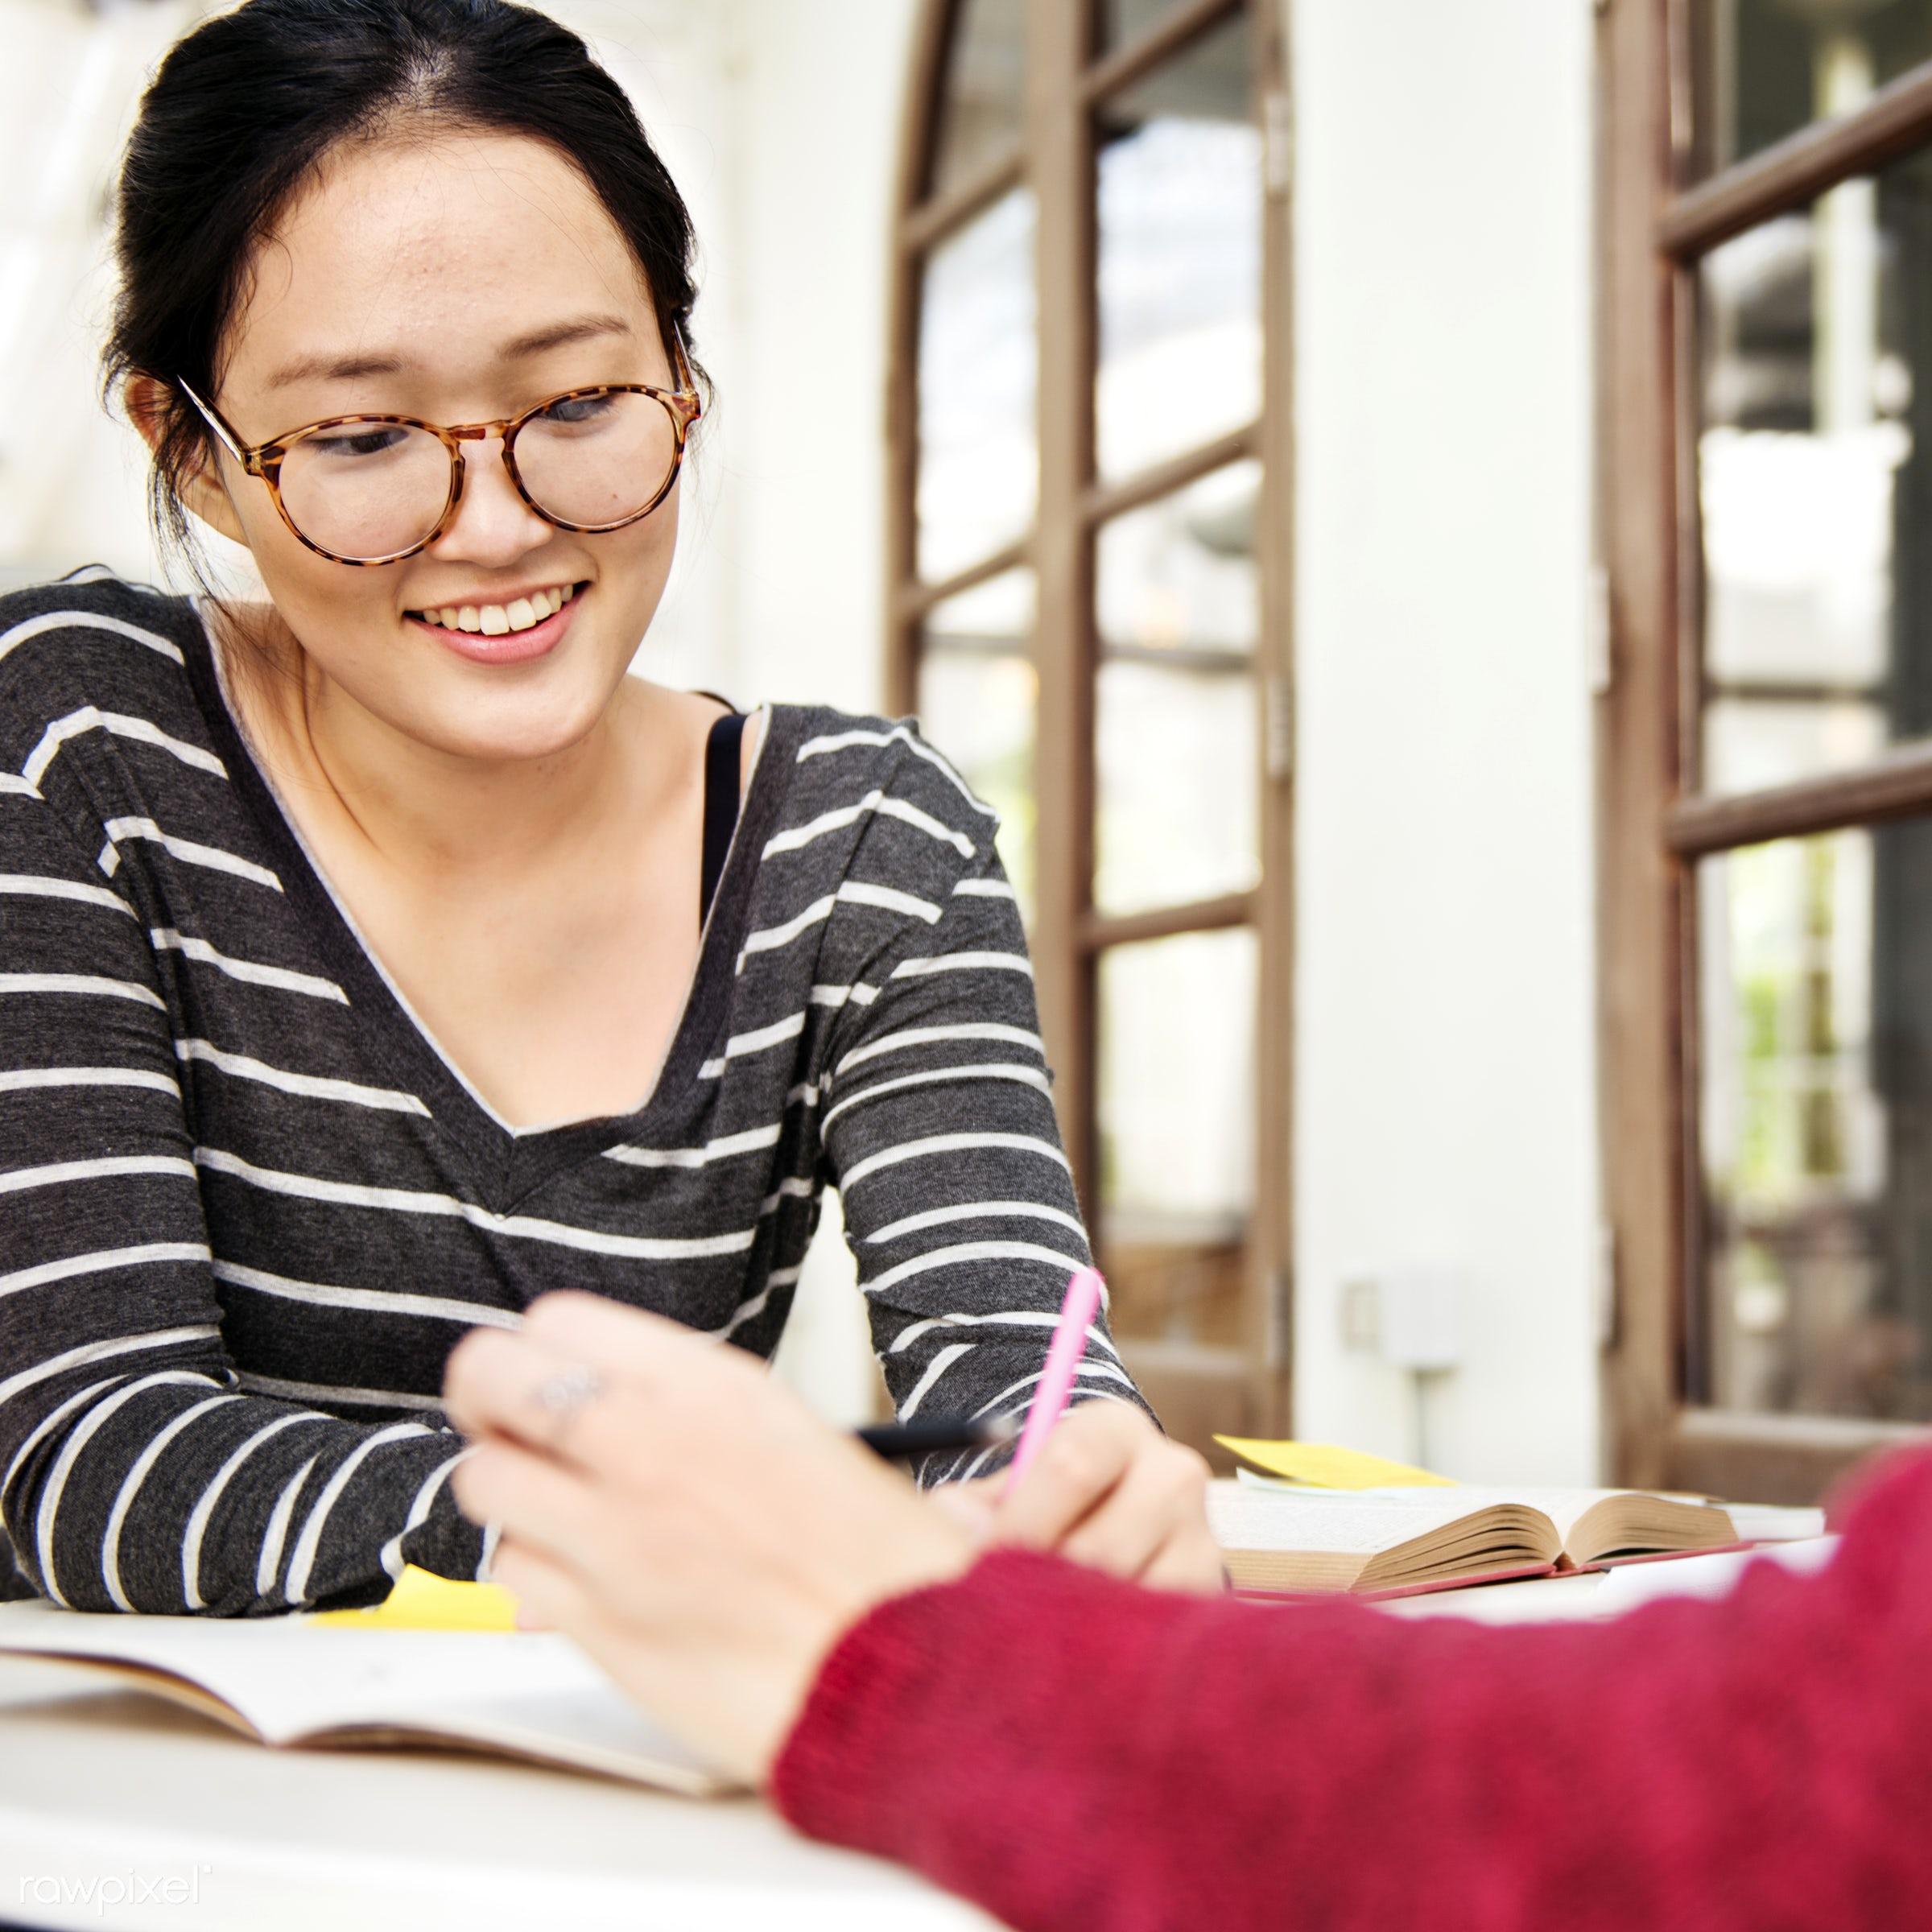 analysing, analysis, asian, bonding, book, brainstorming, campus, casual, caucasian, college, communication, conversation,...